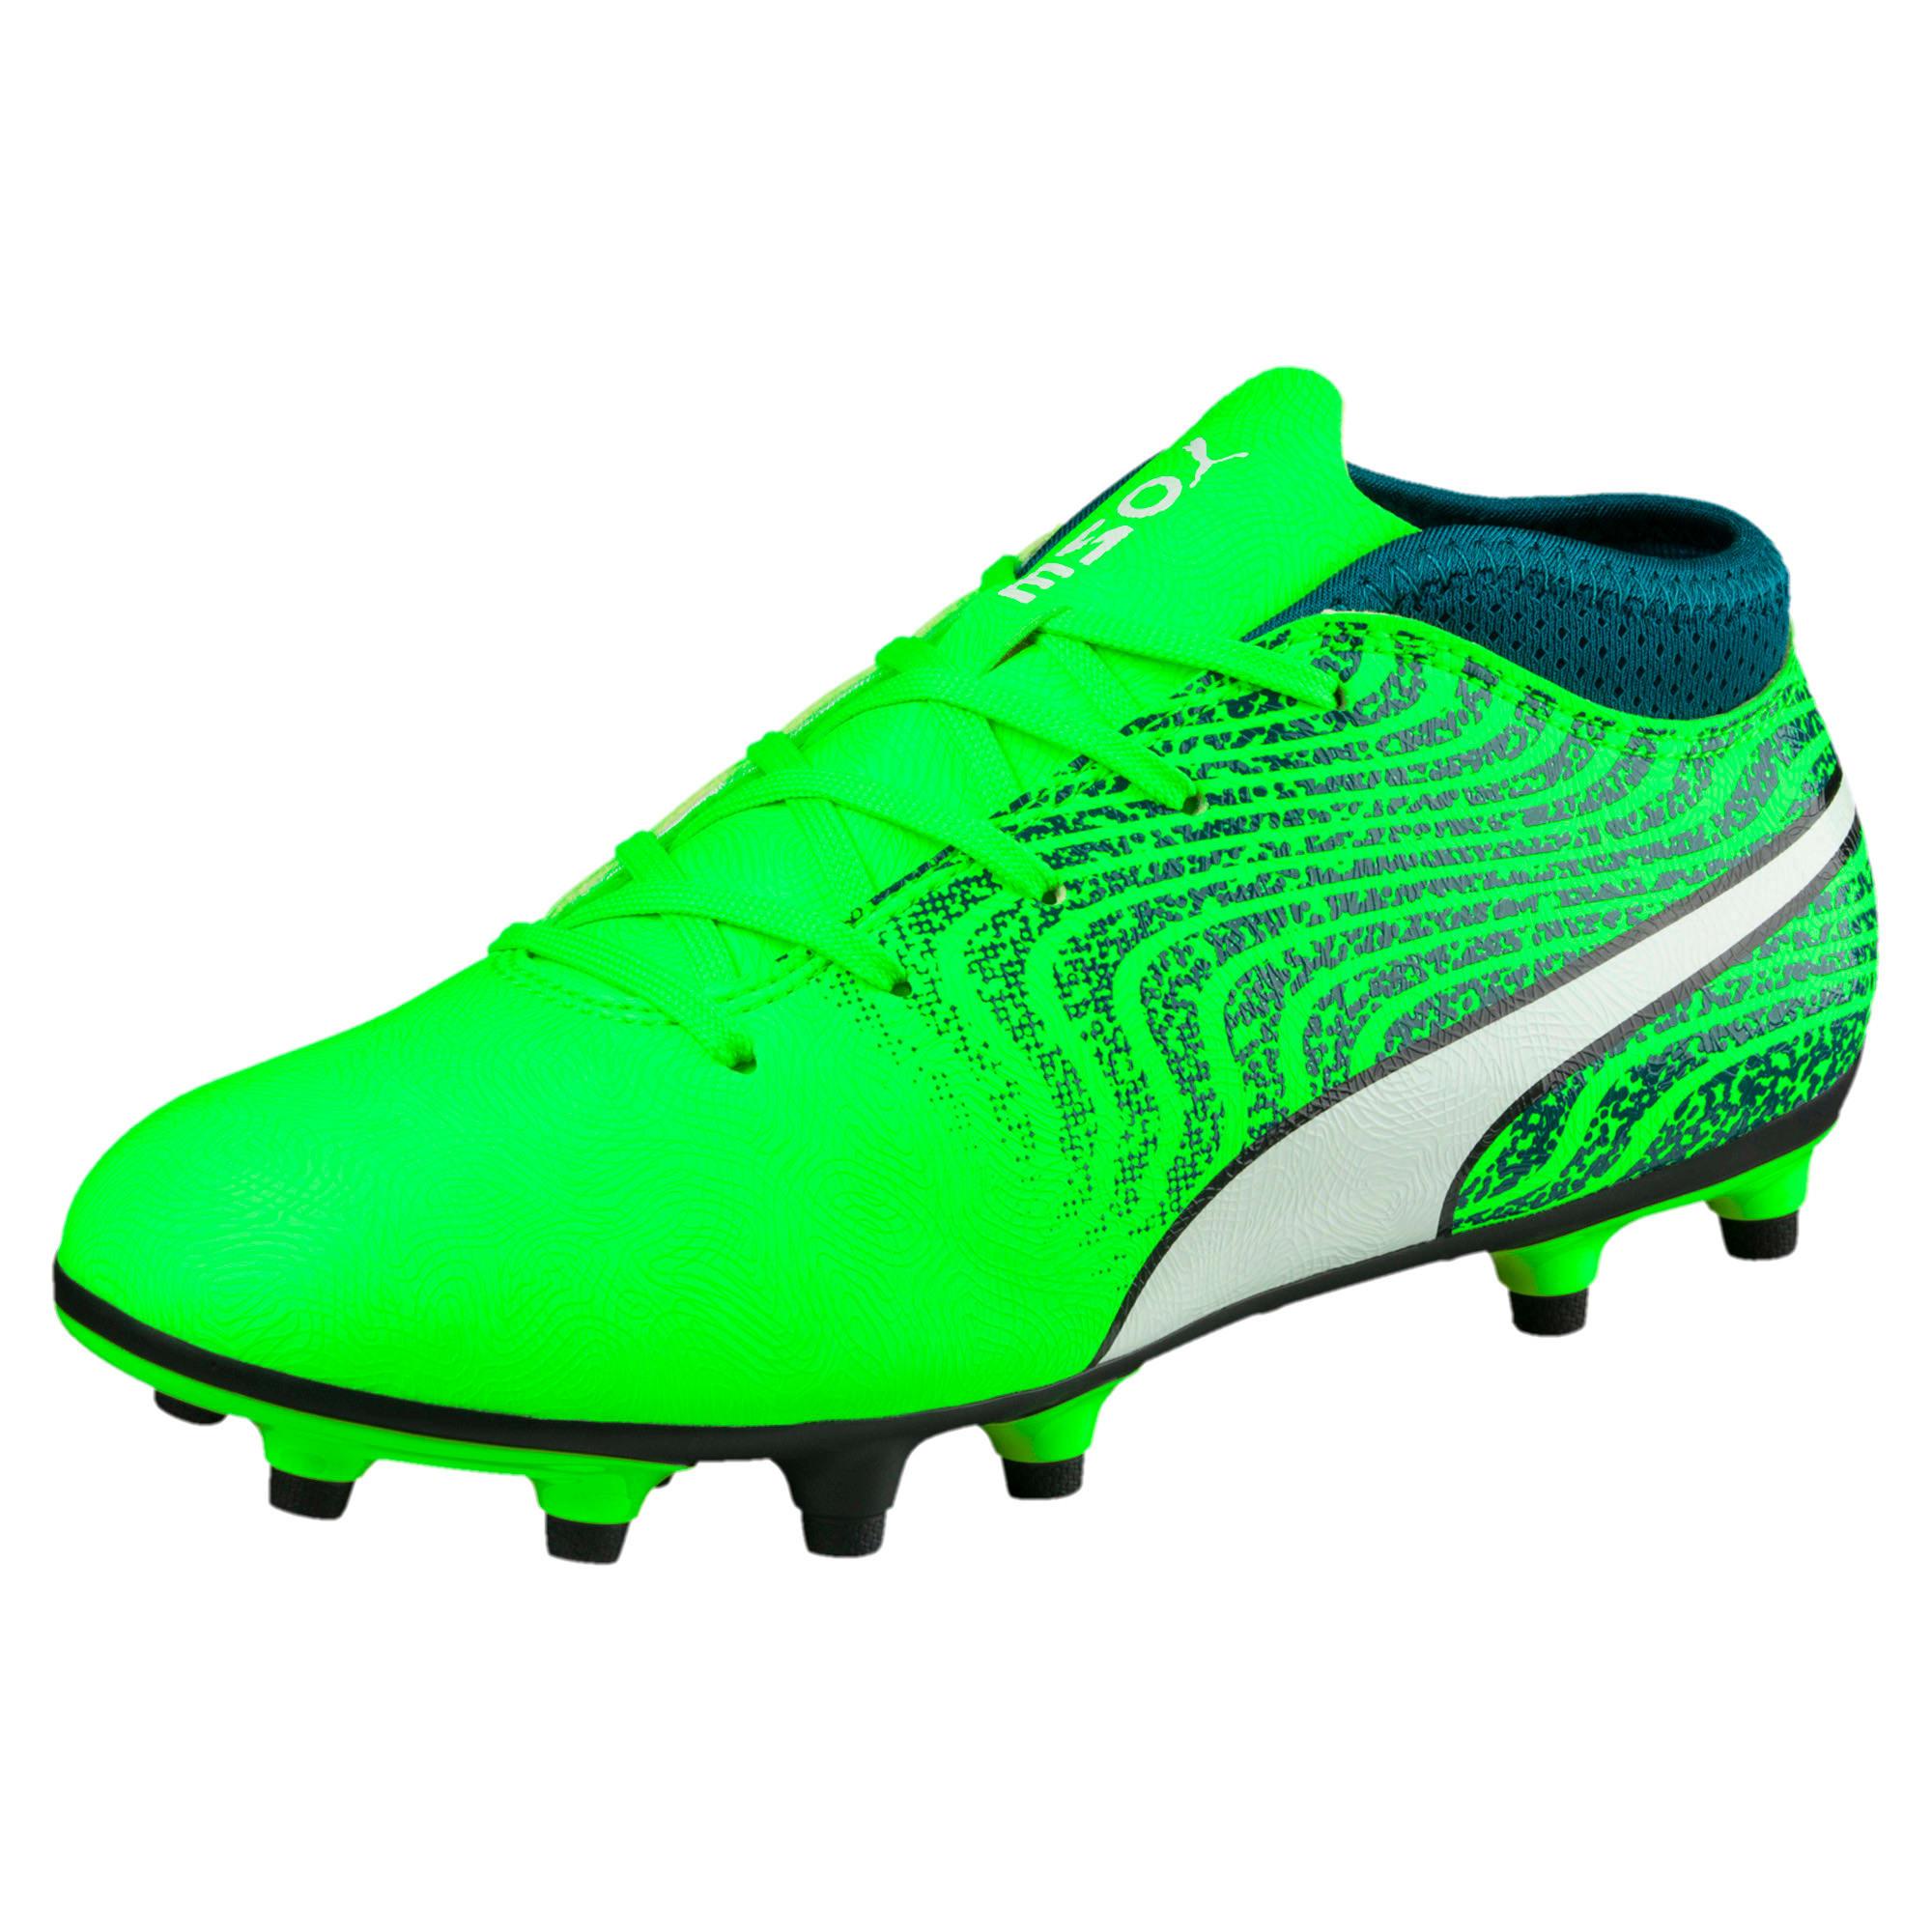 Thumbnail 1 of ONE 18.4 FG Kids' Football Boots, Green-White-Deep Lagoon, medium-IND